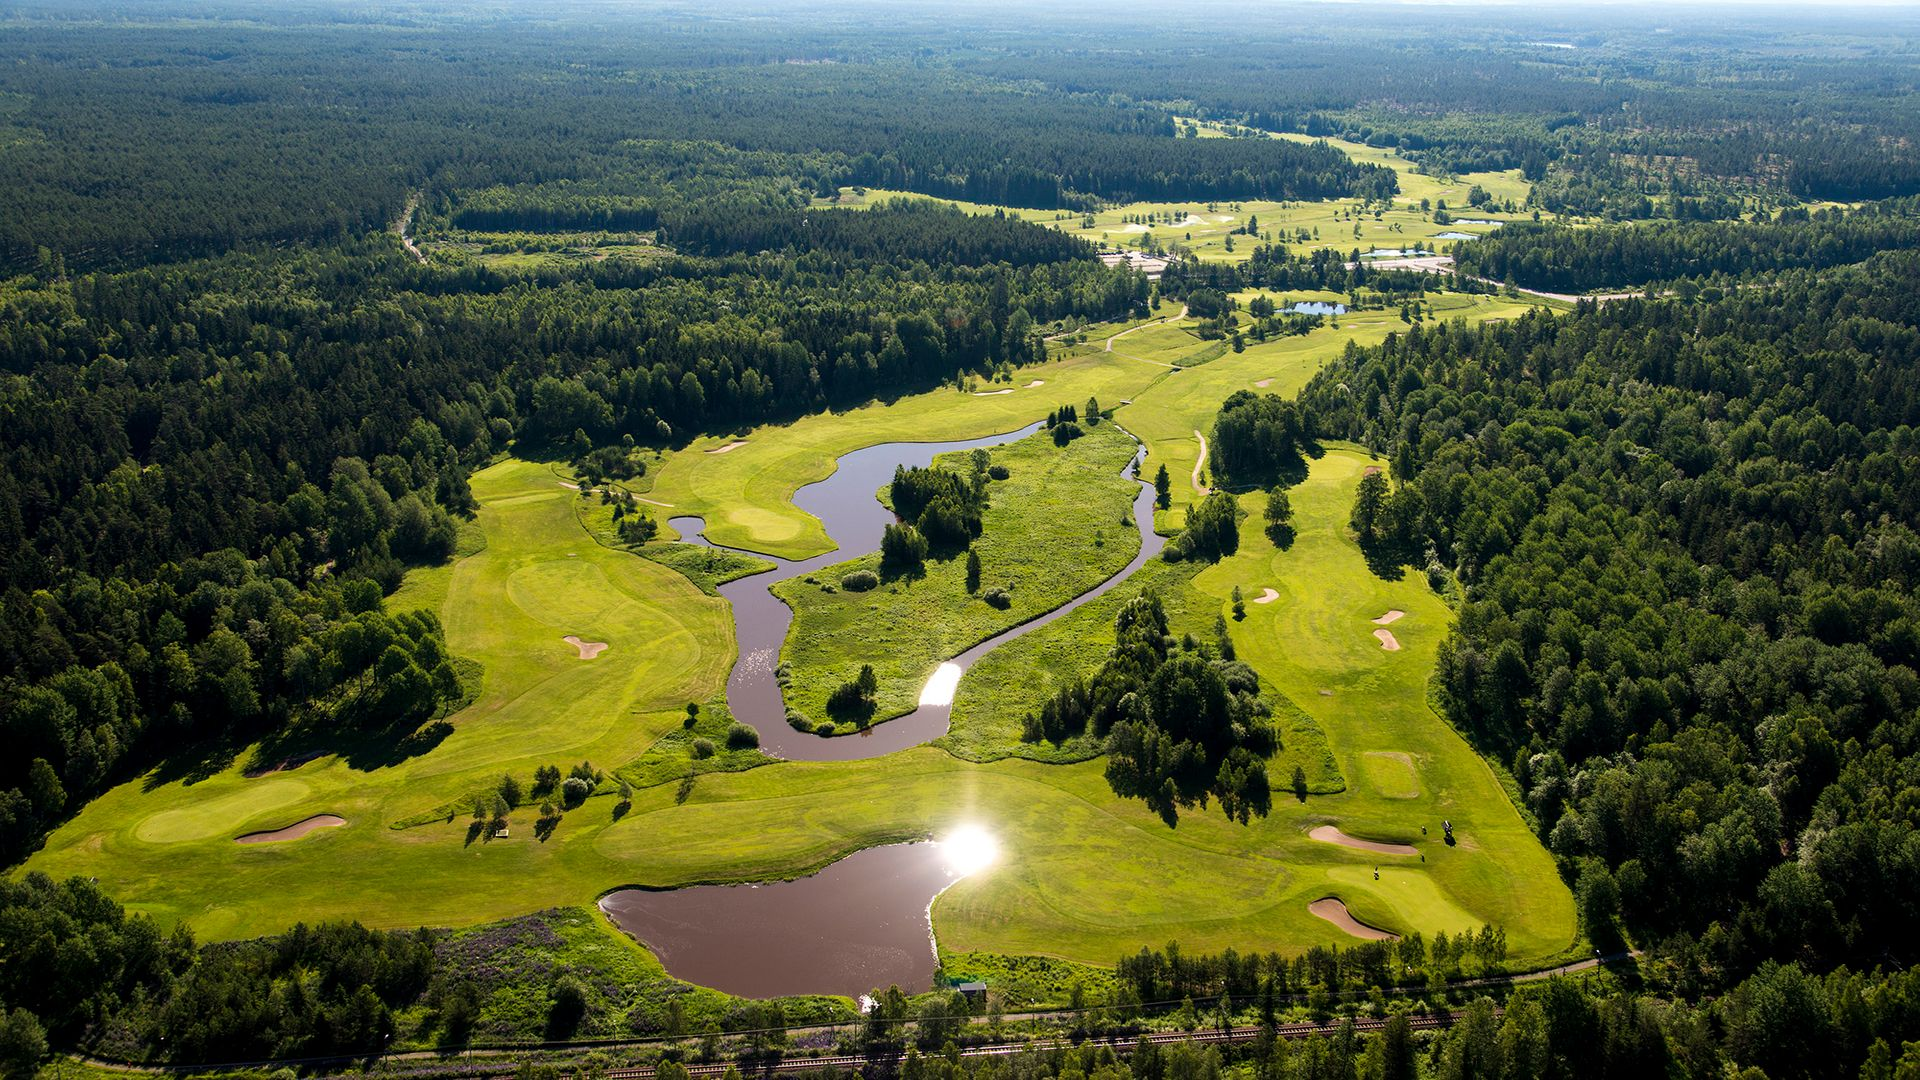 Vy över Surahammars Golfklubb. Fotograf: Pressbild Lennart Hyse